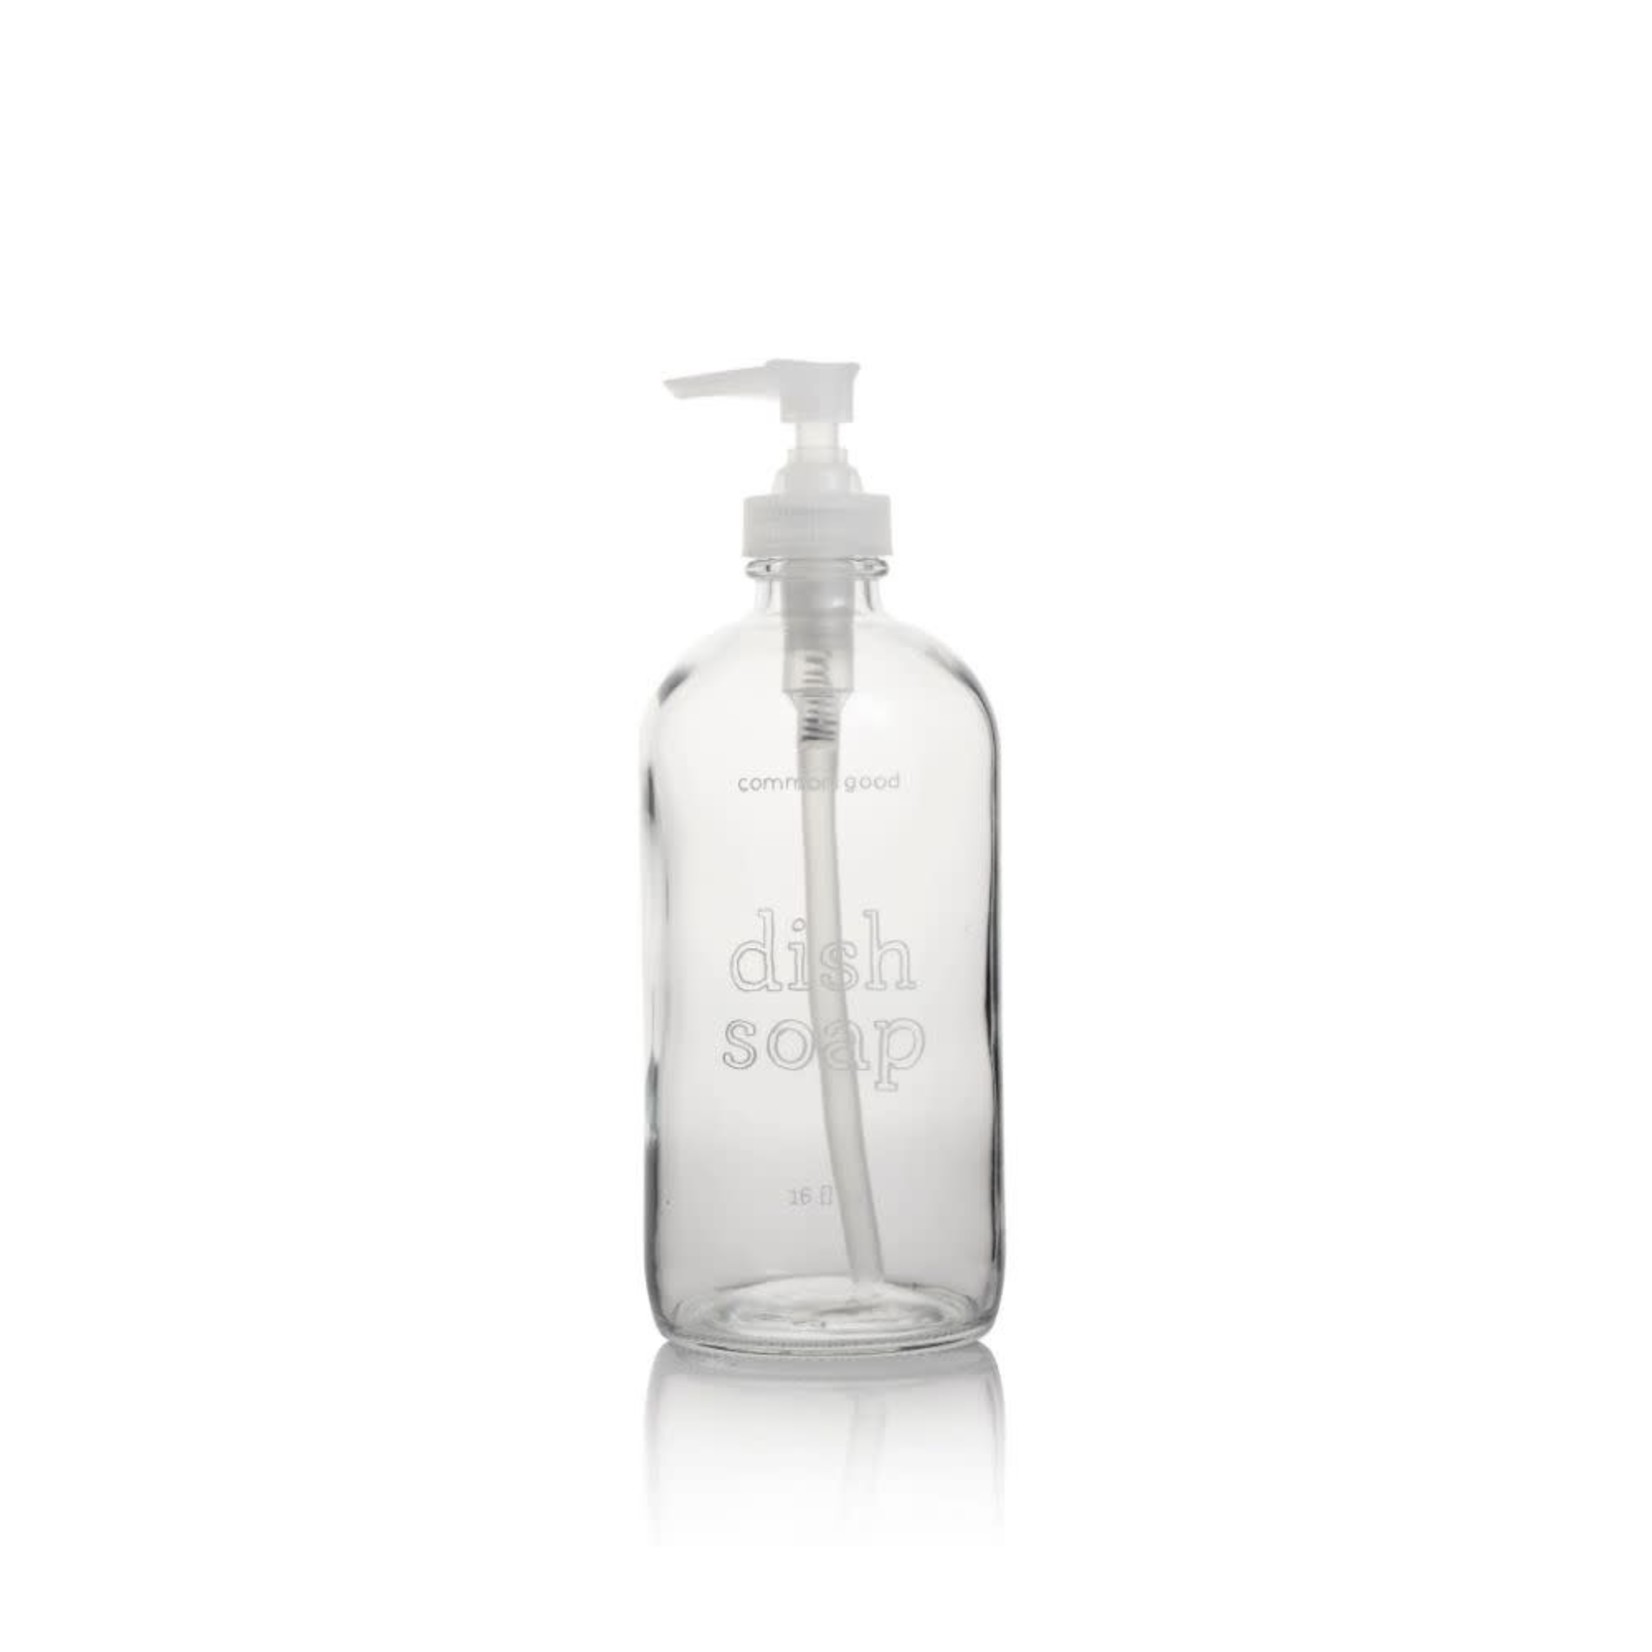 16oz Glass Bottle, Dish Soap